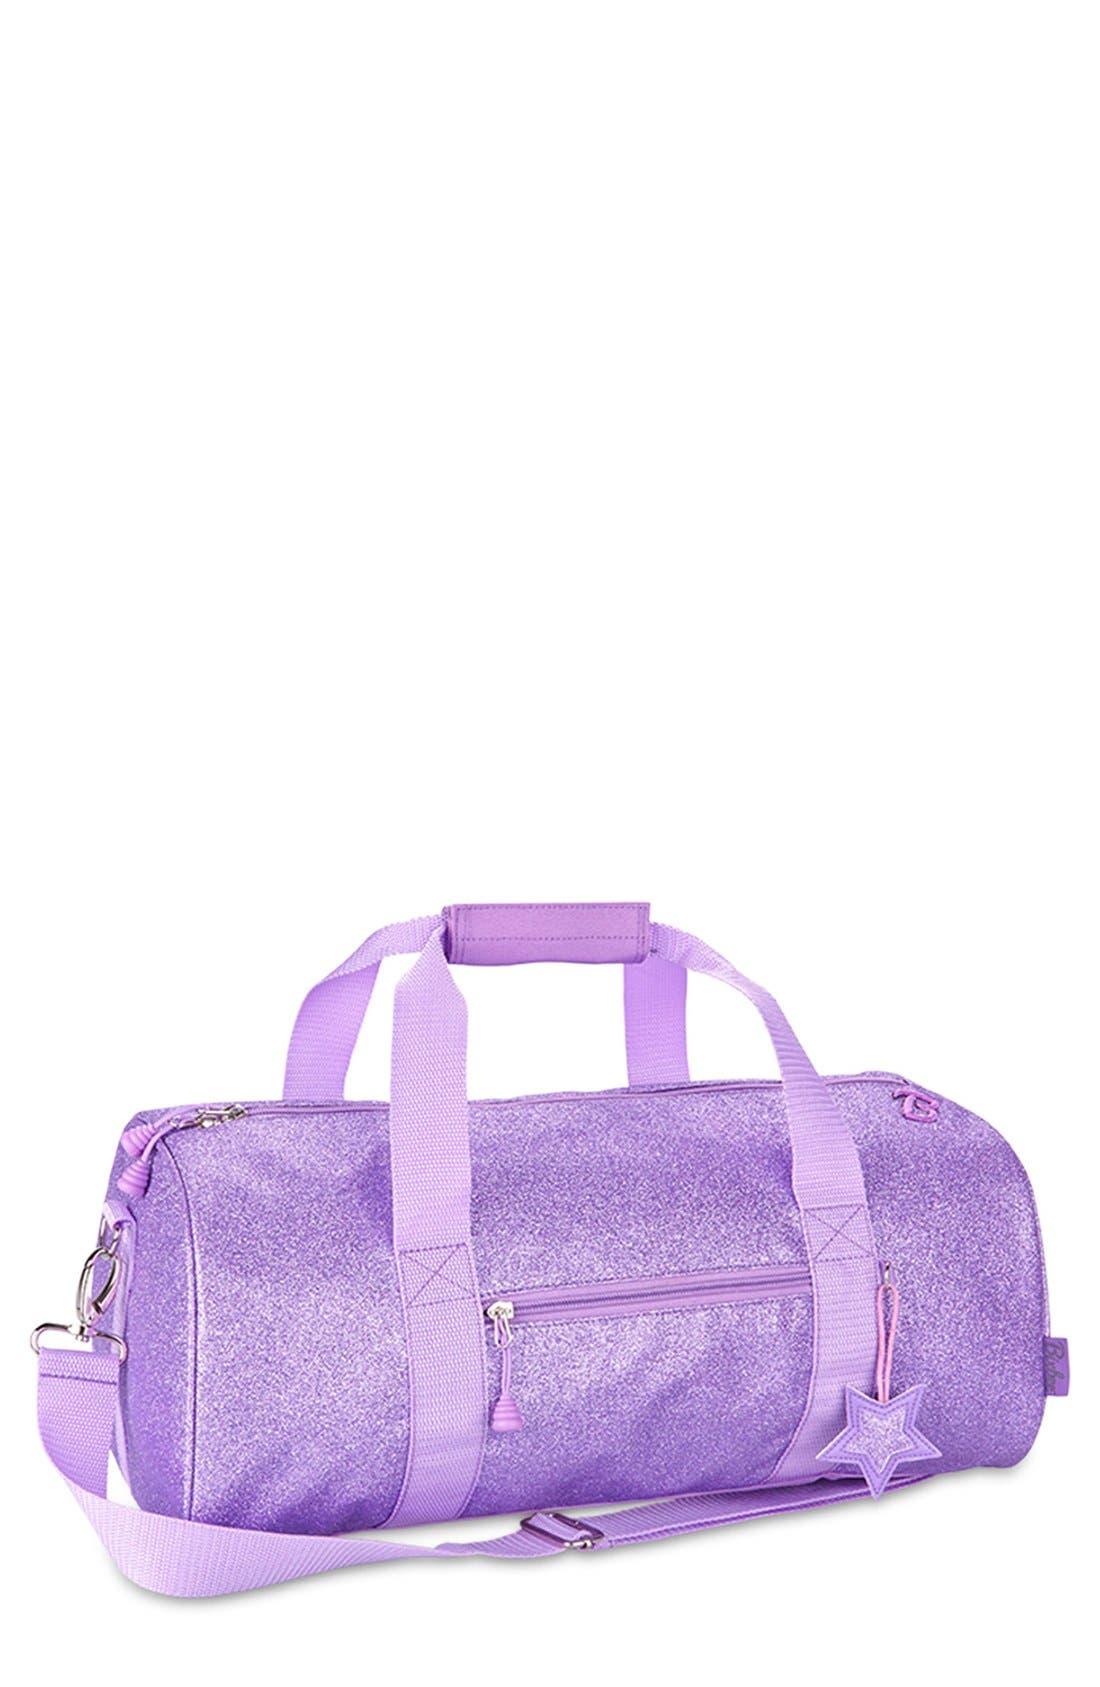 BIXBEE Large Sparkalicious Dance & Sports Duffel Bag